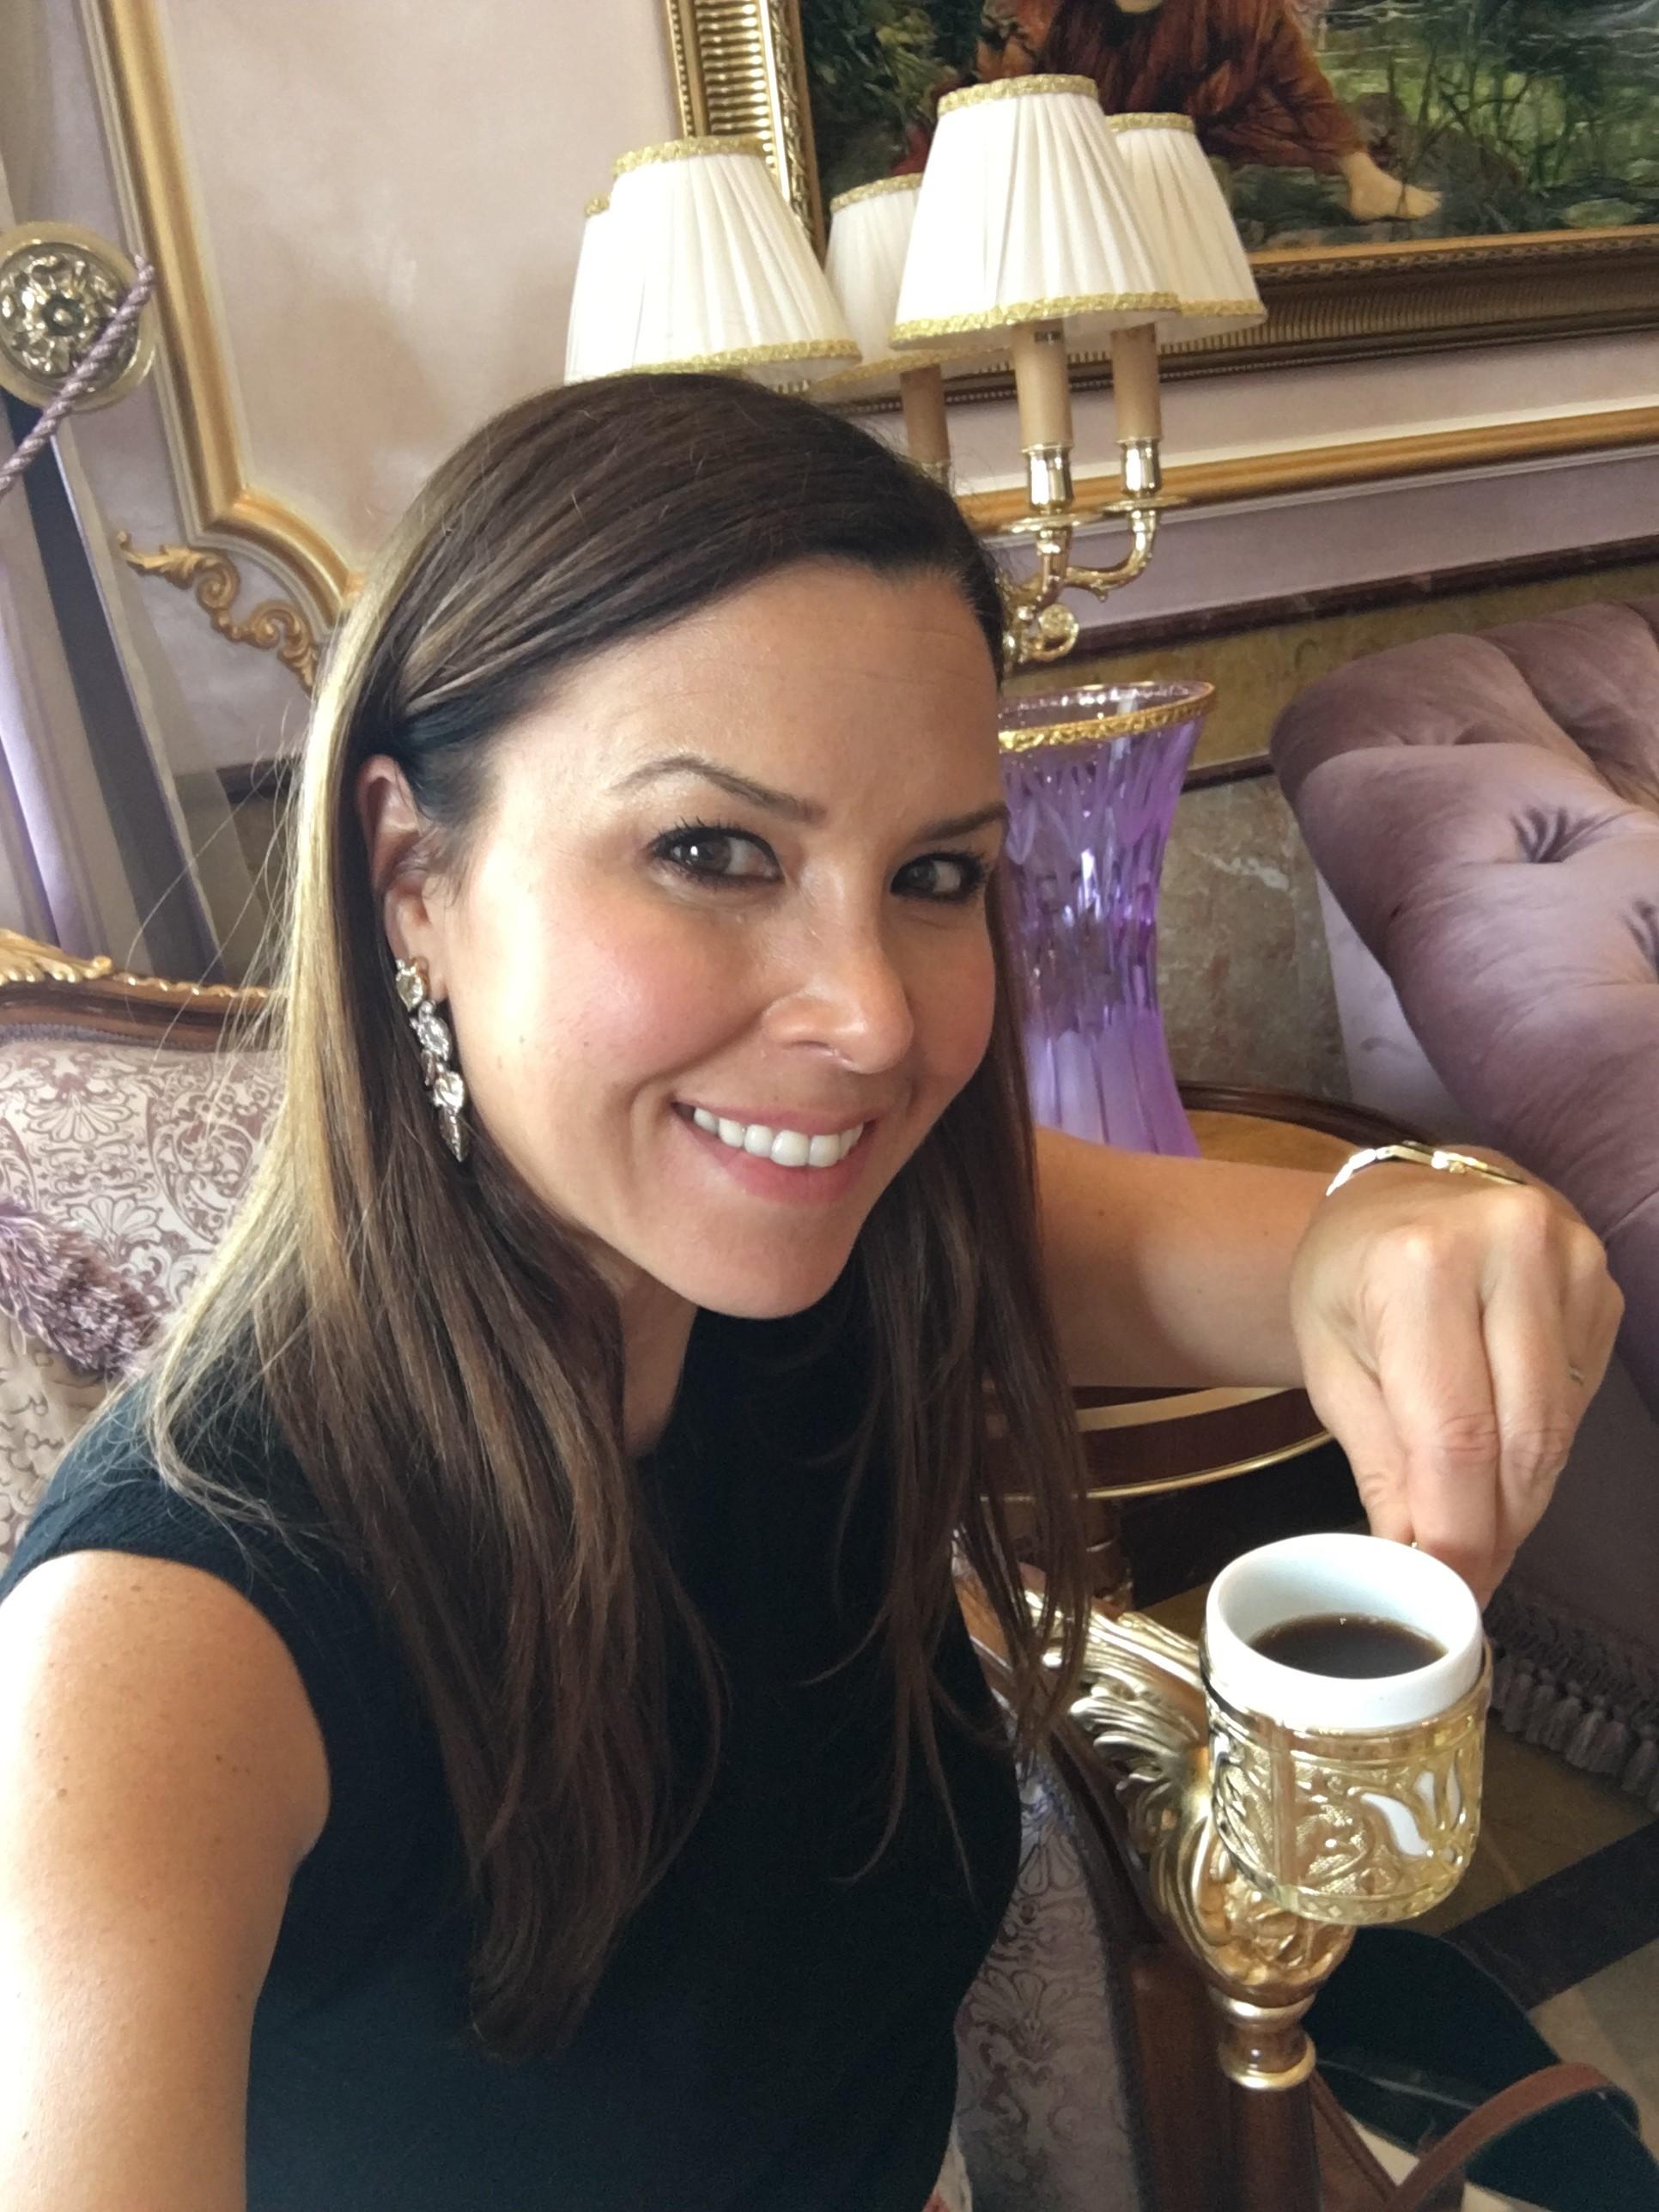 Monique Lhuillier travel diary: Loving the hospitality in Doha